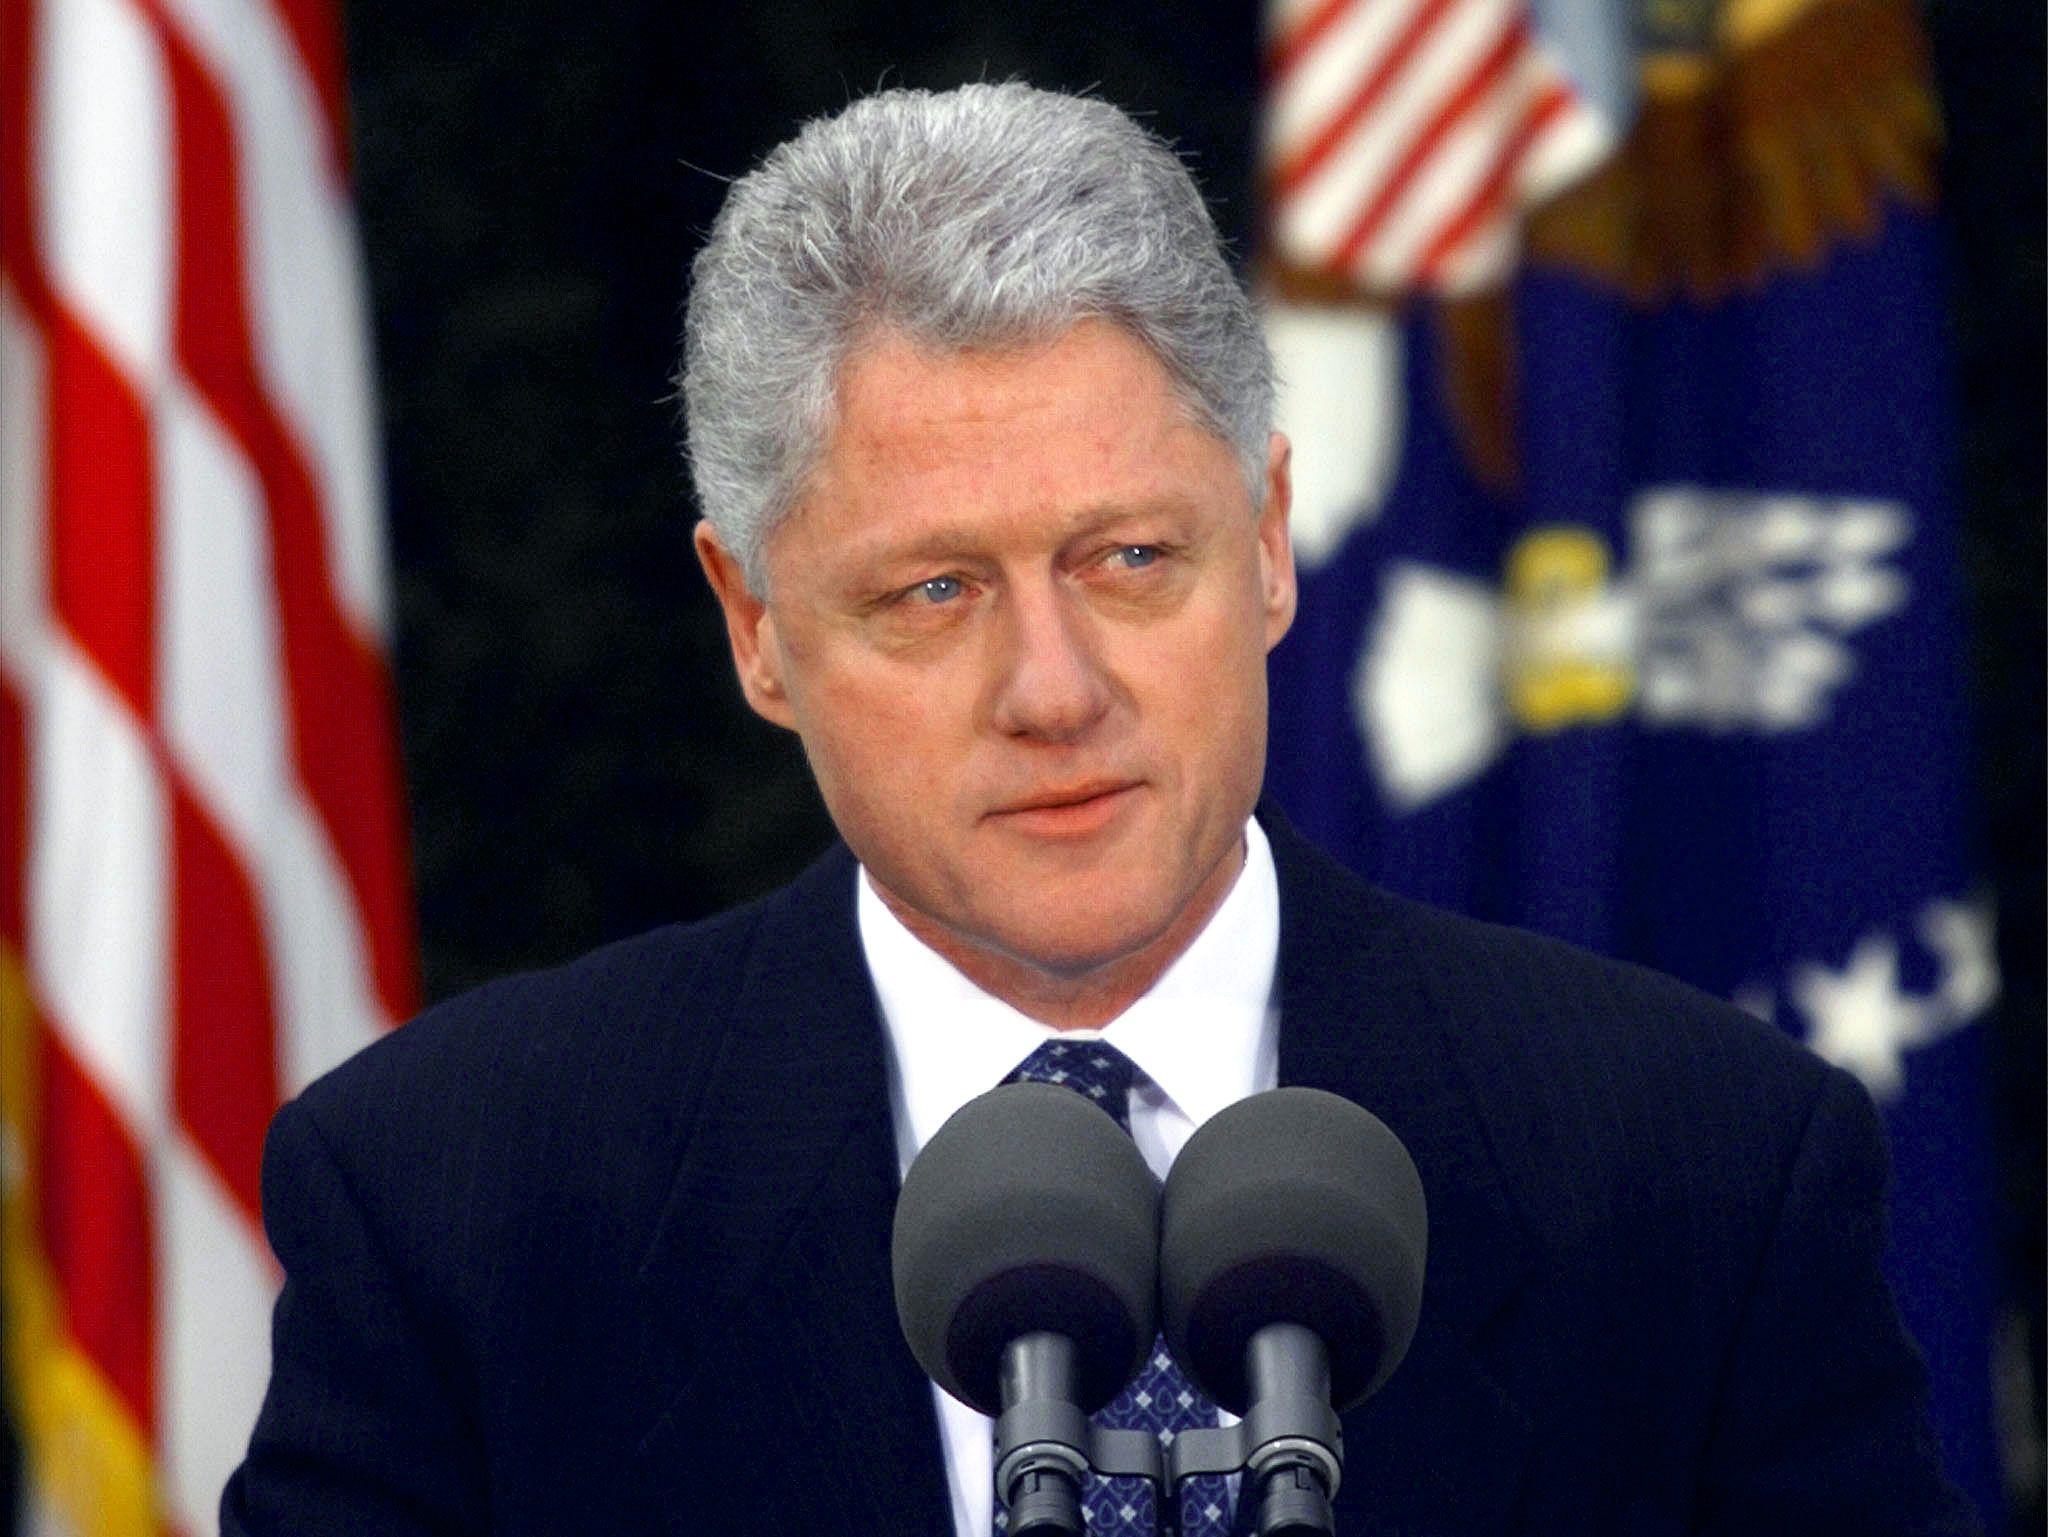 Clinton Addresses Nation